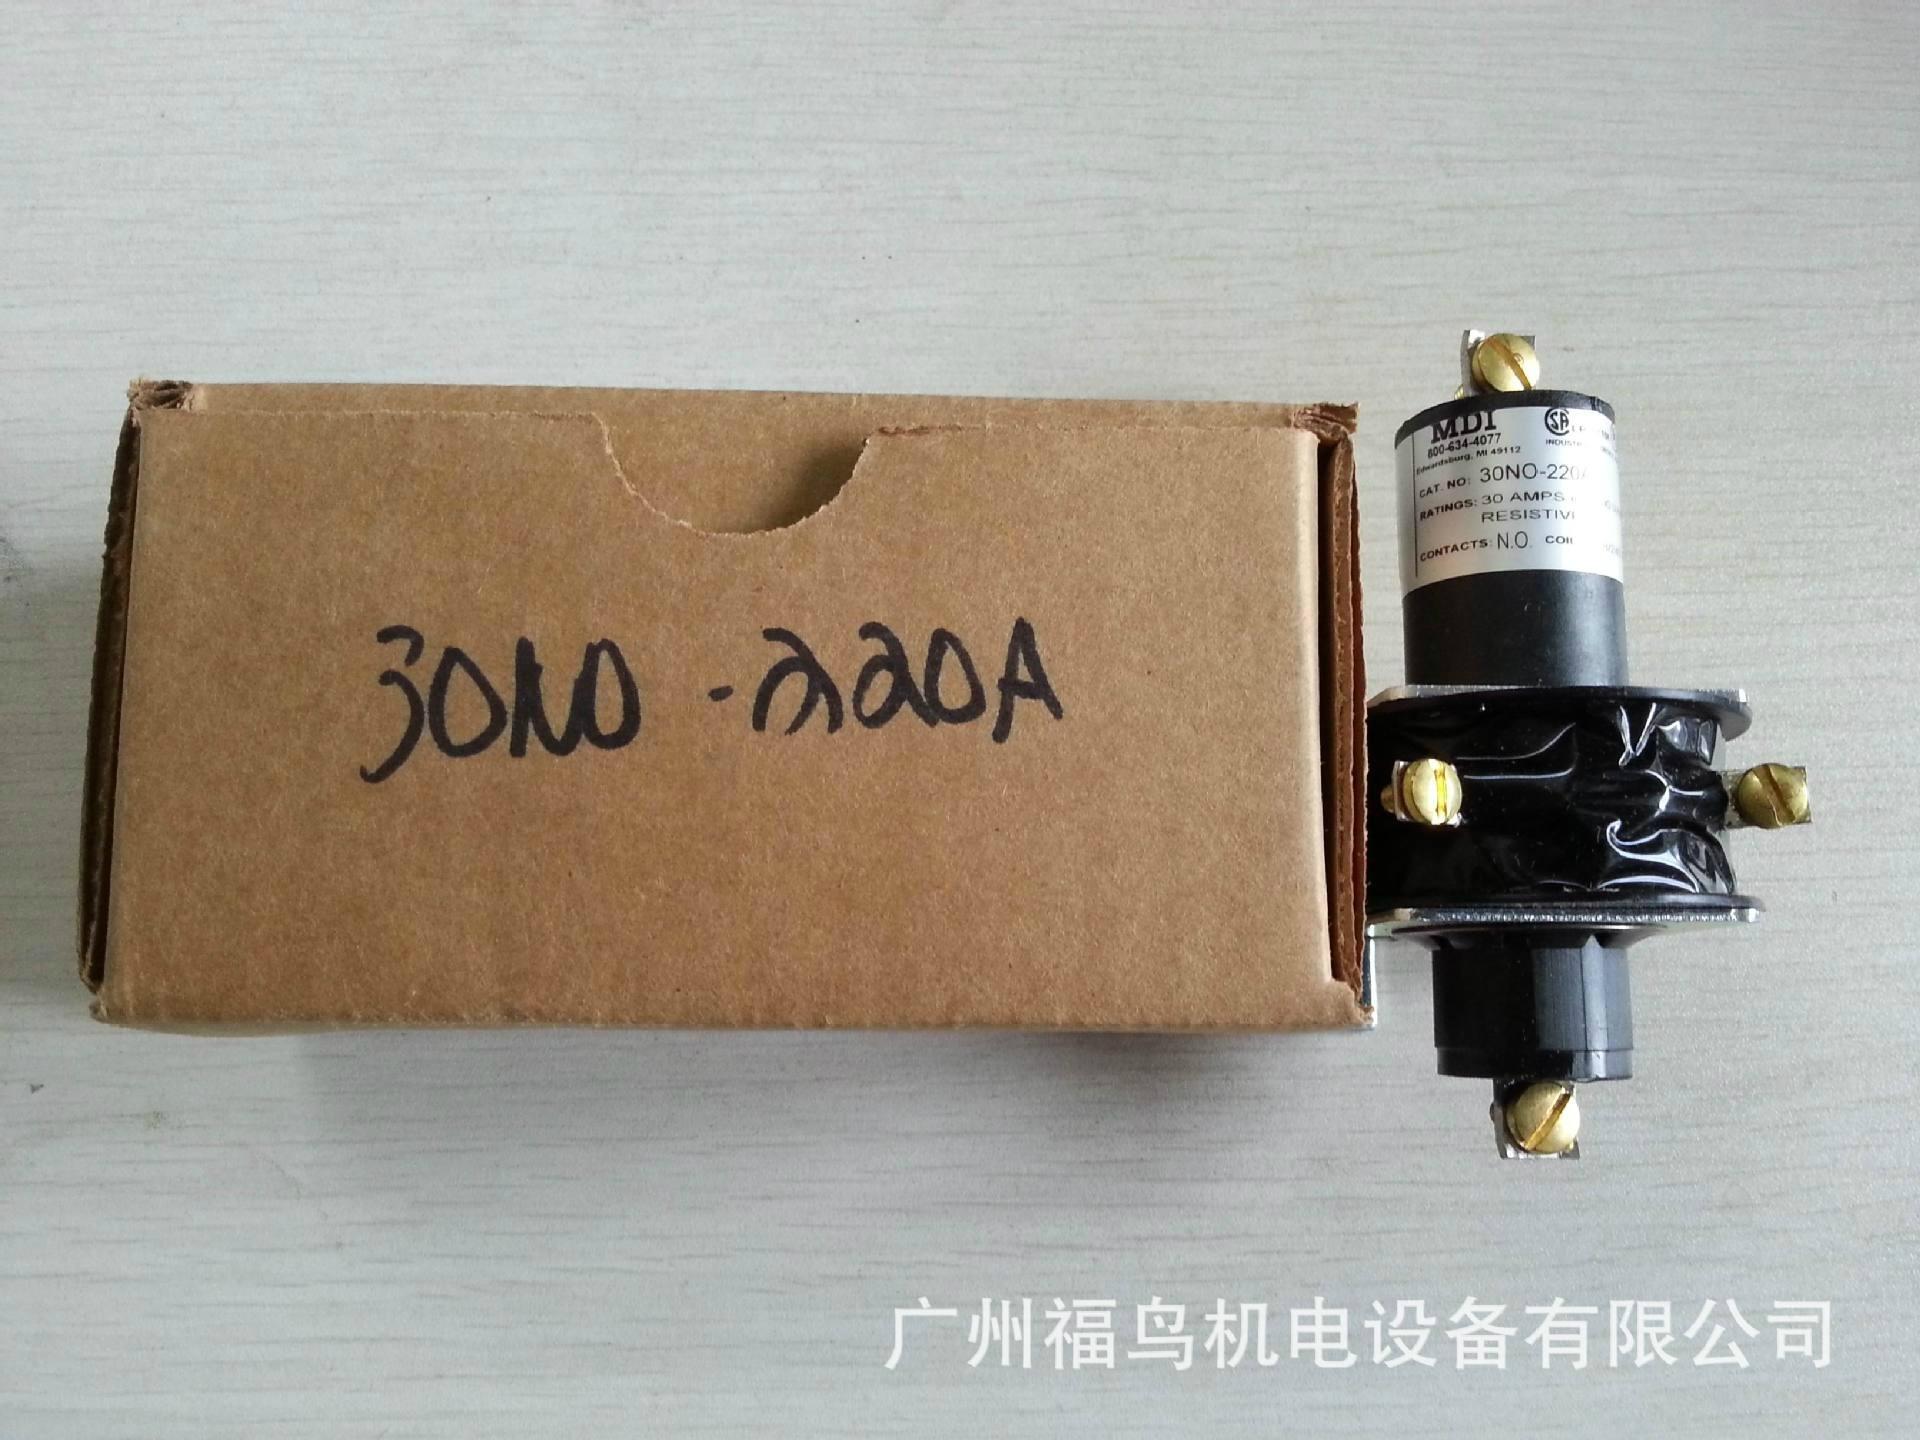 MDI水銀接觸器, 型號: 30NO-220A